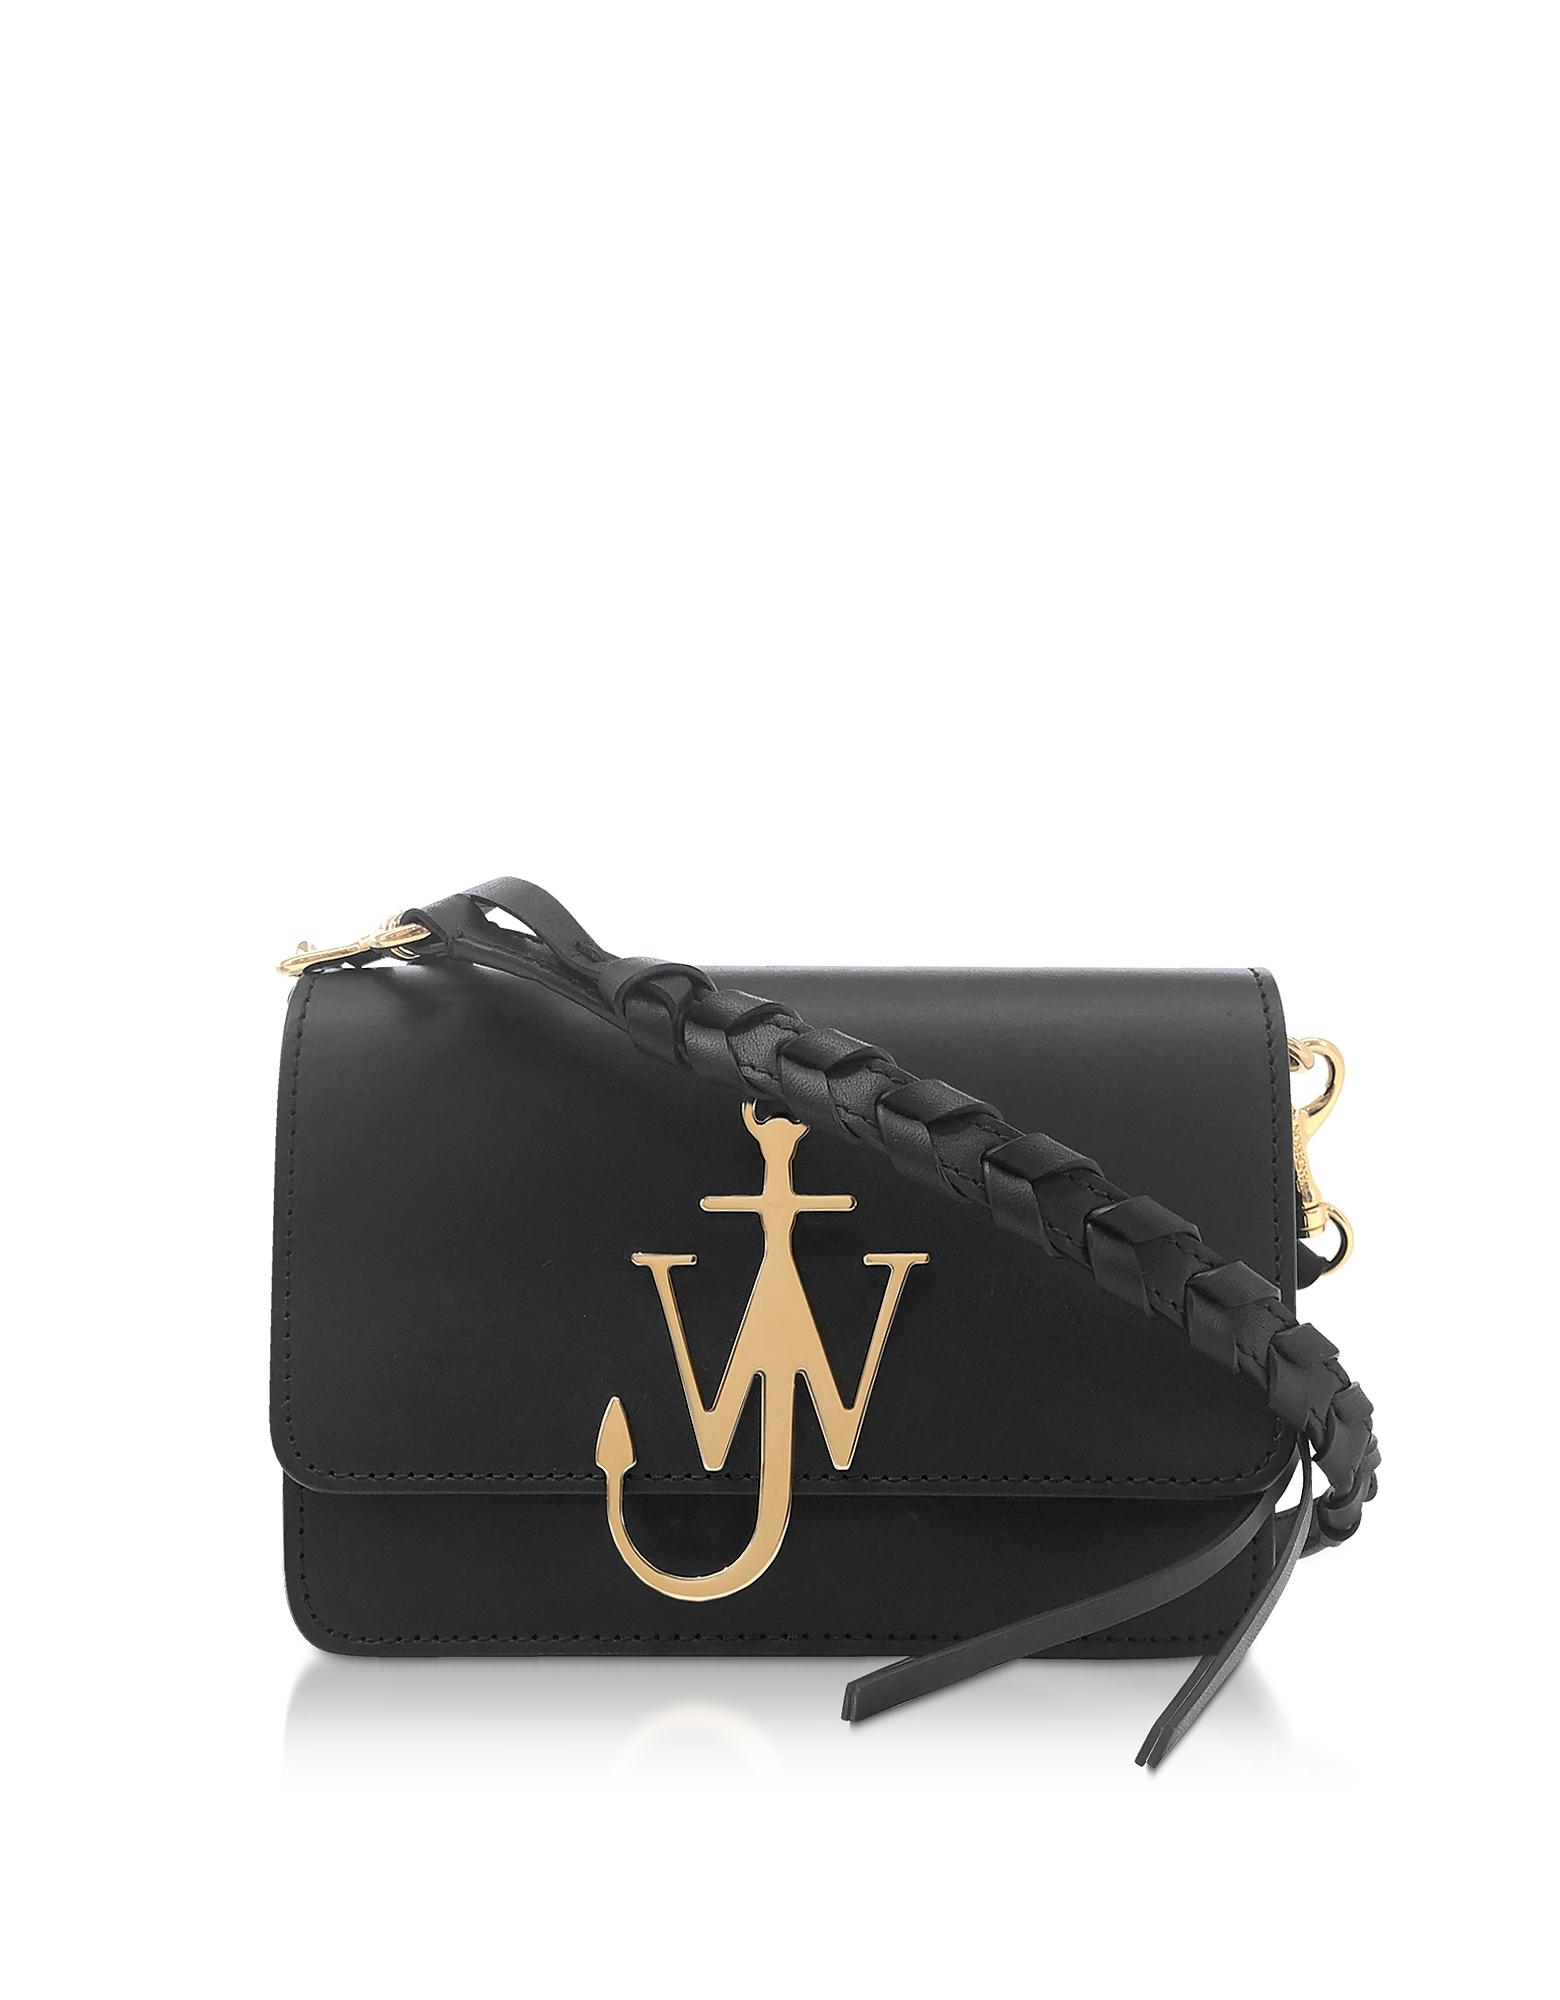 JW Anderson Designer Handbags, Black Anchor Logo Bag w/Braided Shoulder Strap